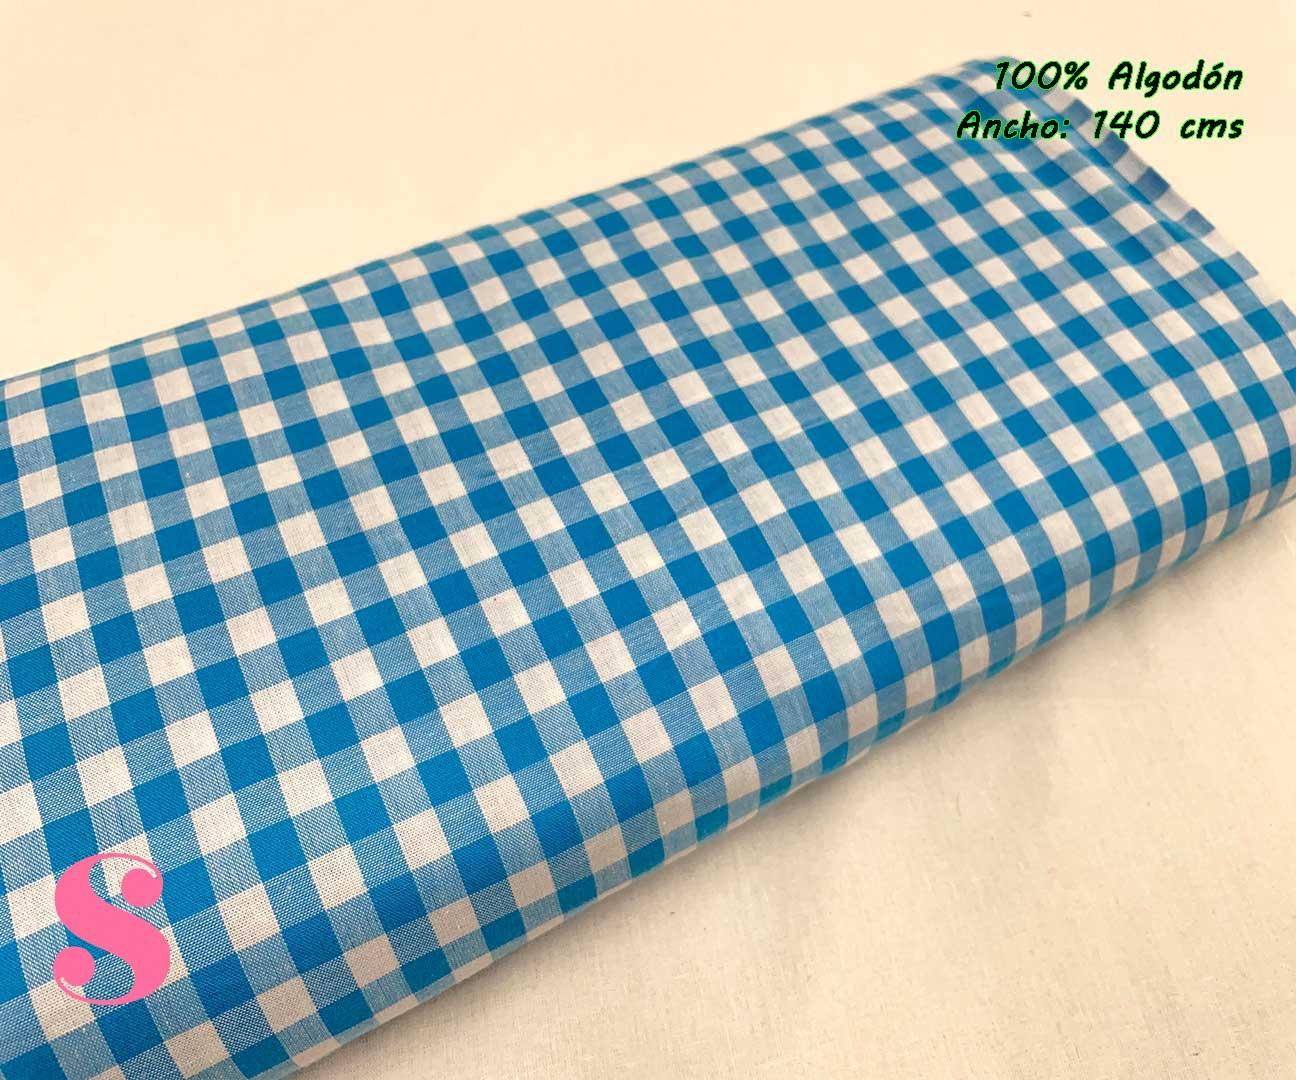 15-telas-de-algodón-100%,telas-infantiles,estampados-infantiles,telas-para-bebes,Vicky Algodón Cuadros Azul 1 Centímetro